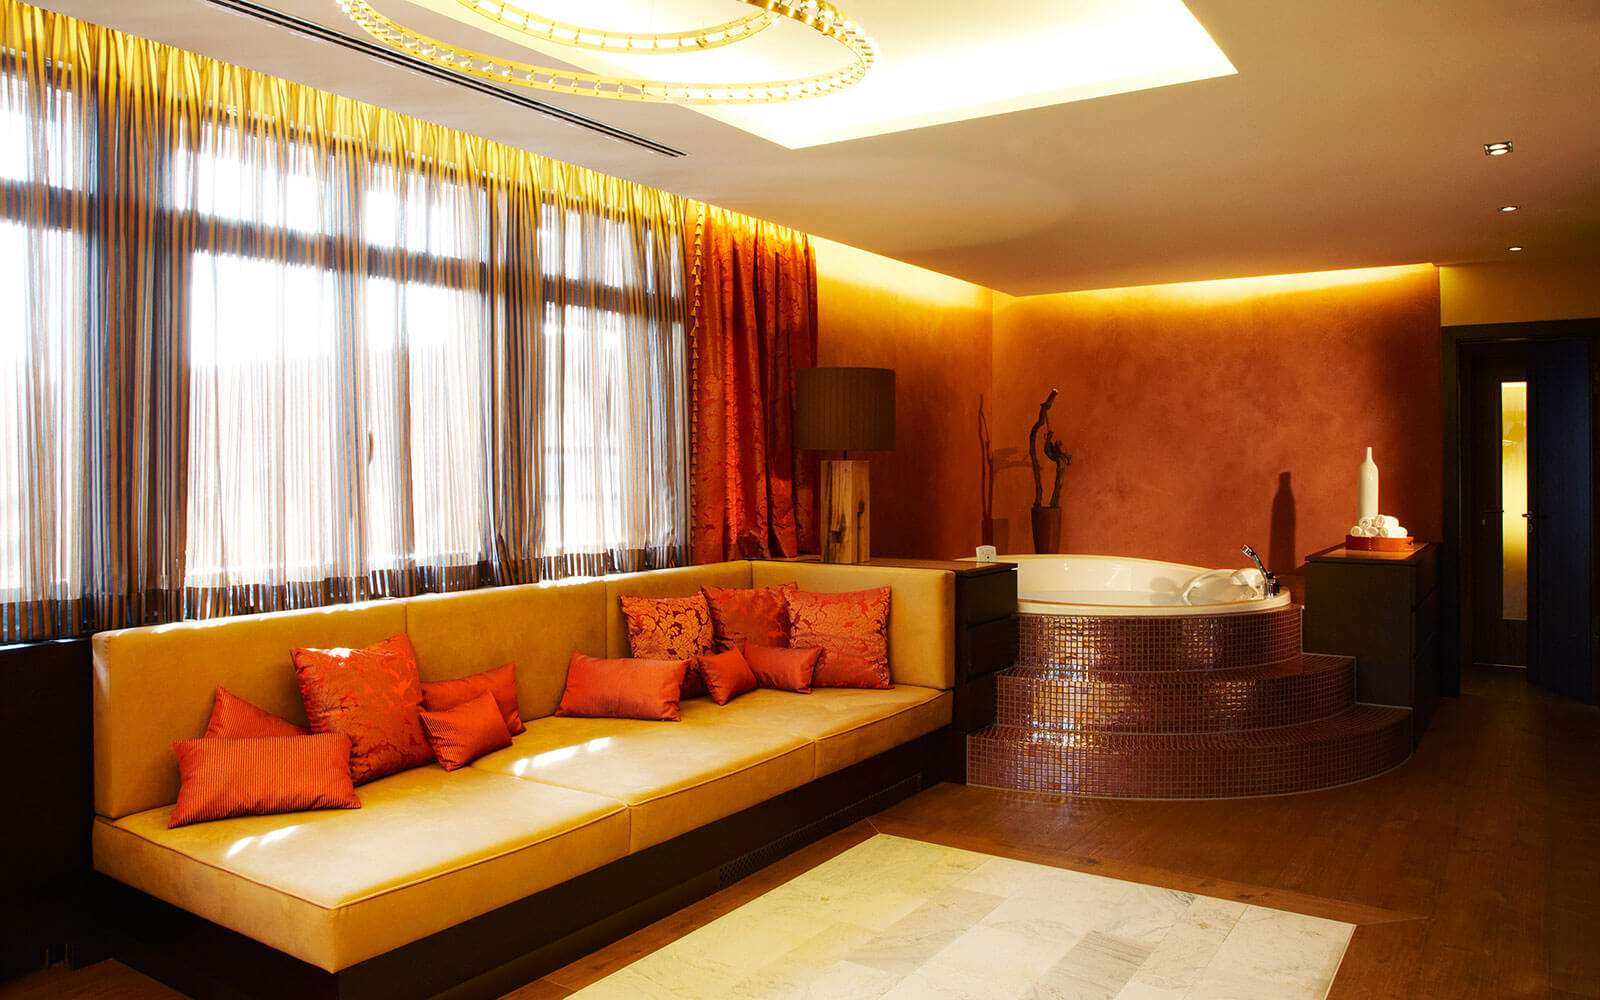 Indulgent KLAFS SANARIUM® at Countryside Hotel